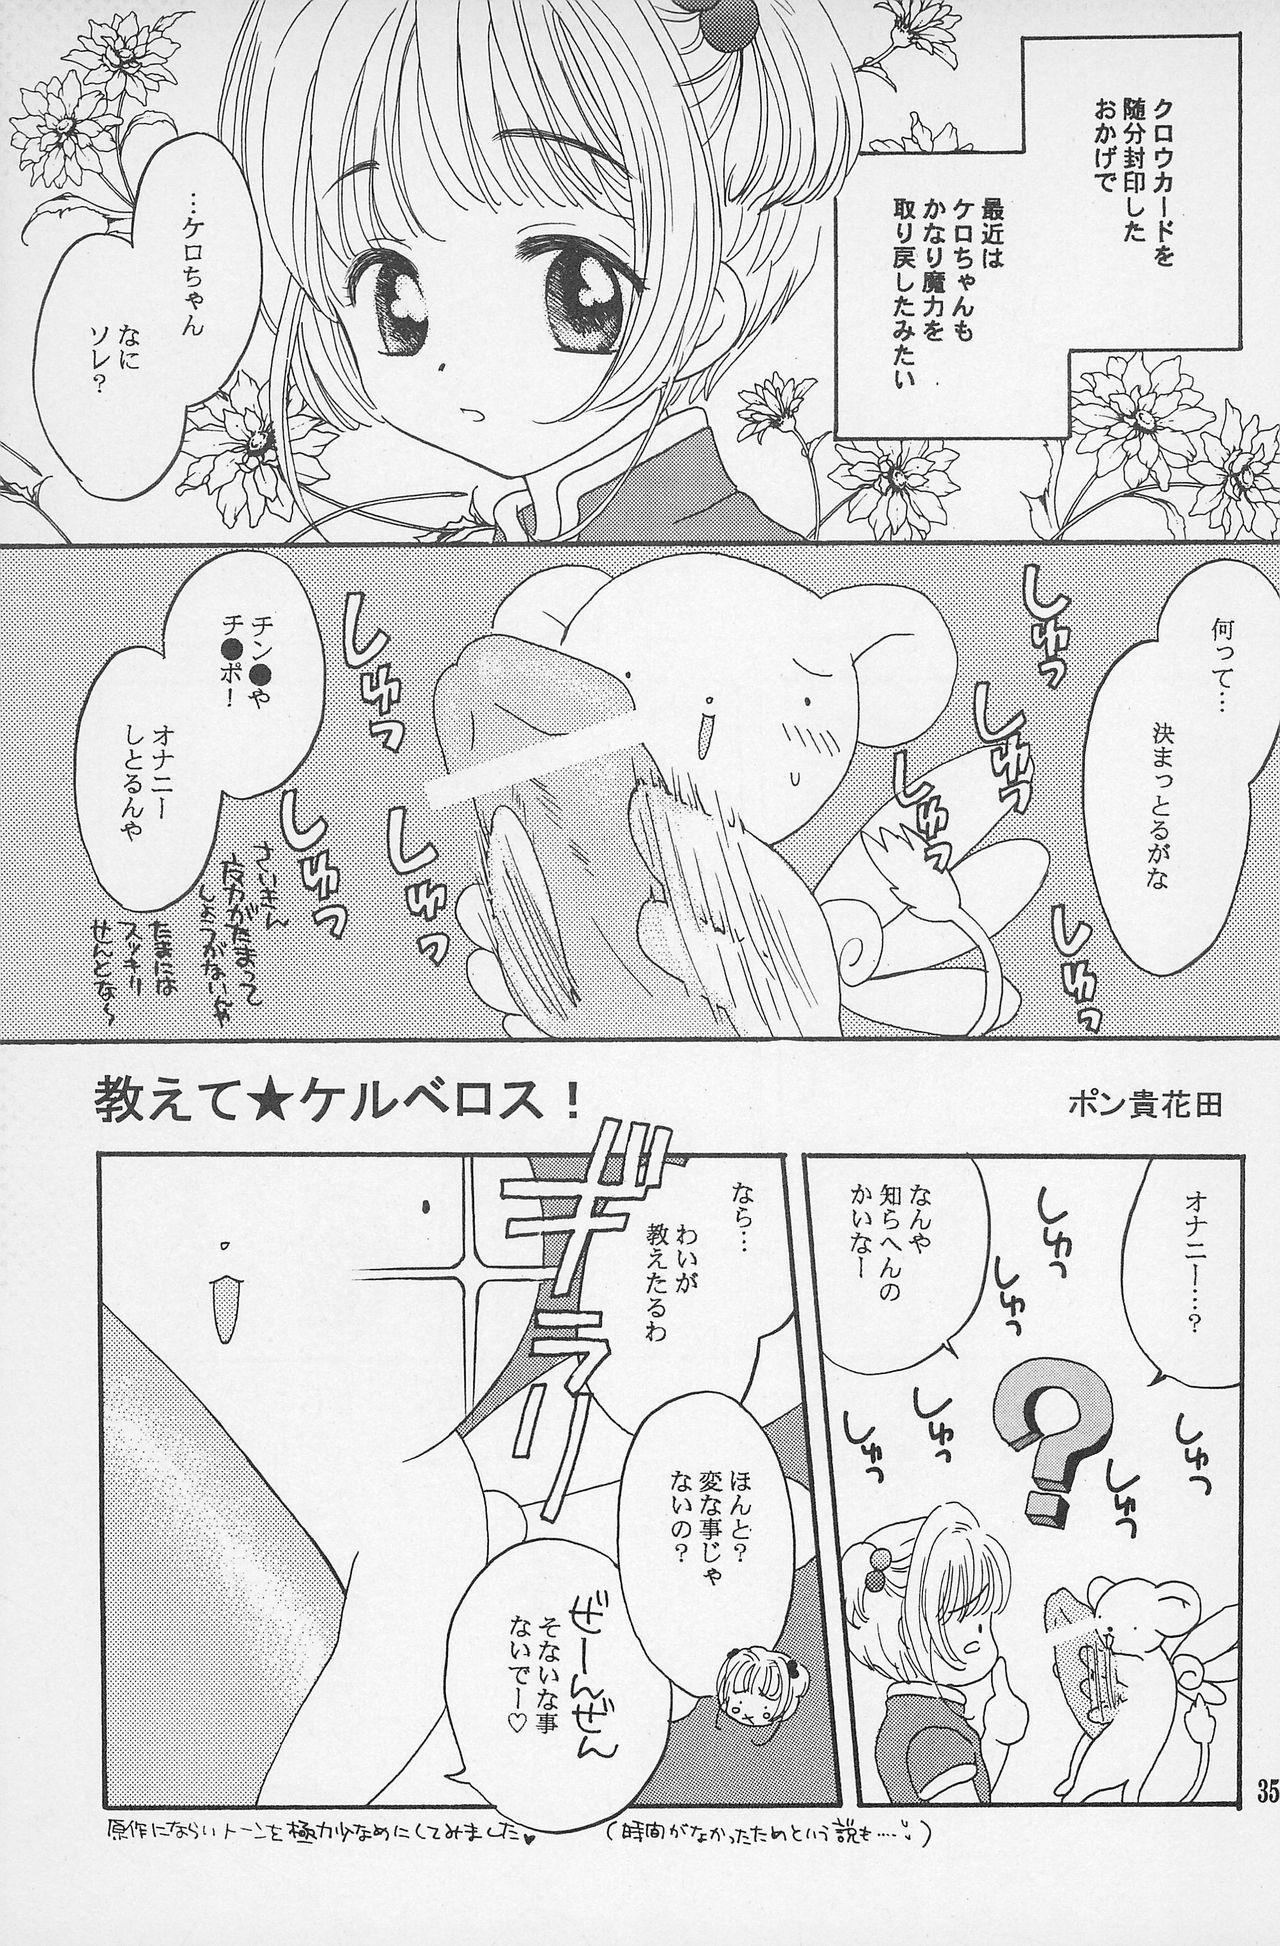 Super Loli Loli Daisakusen! 36